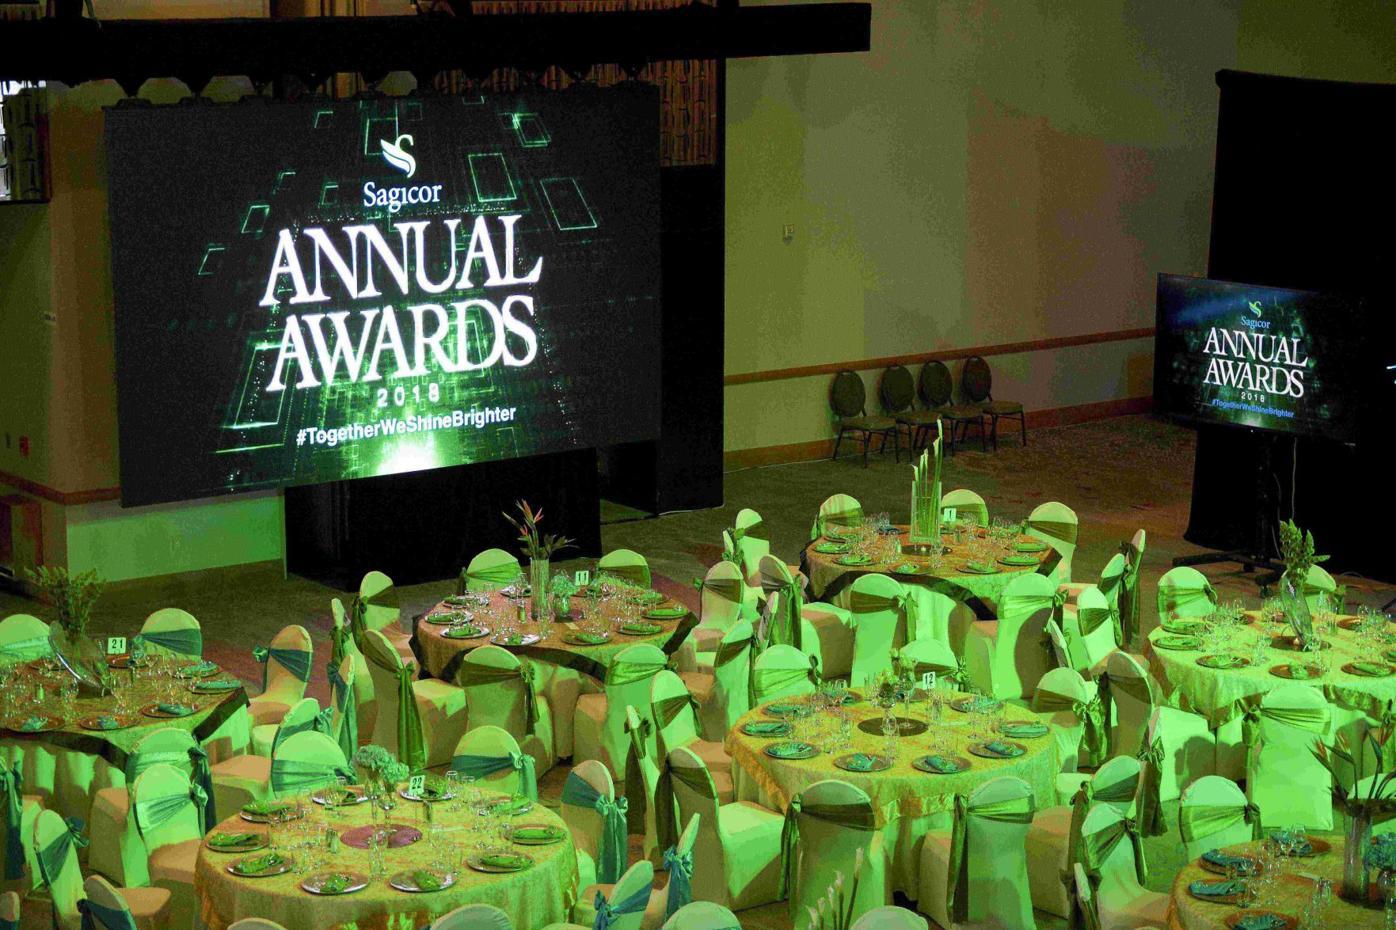 Sagicor Annual Awards 2019